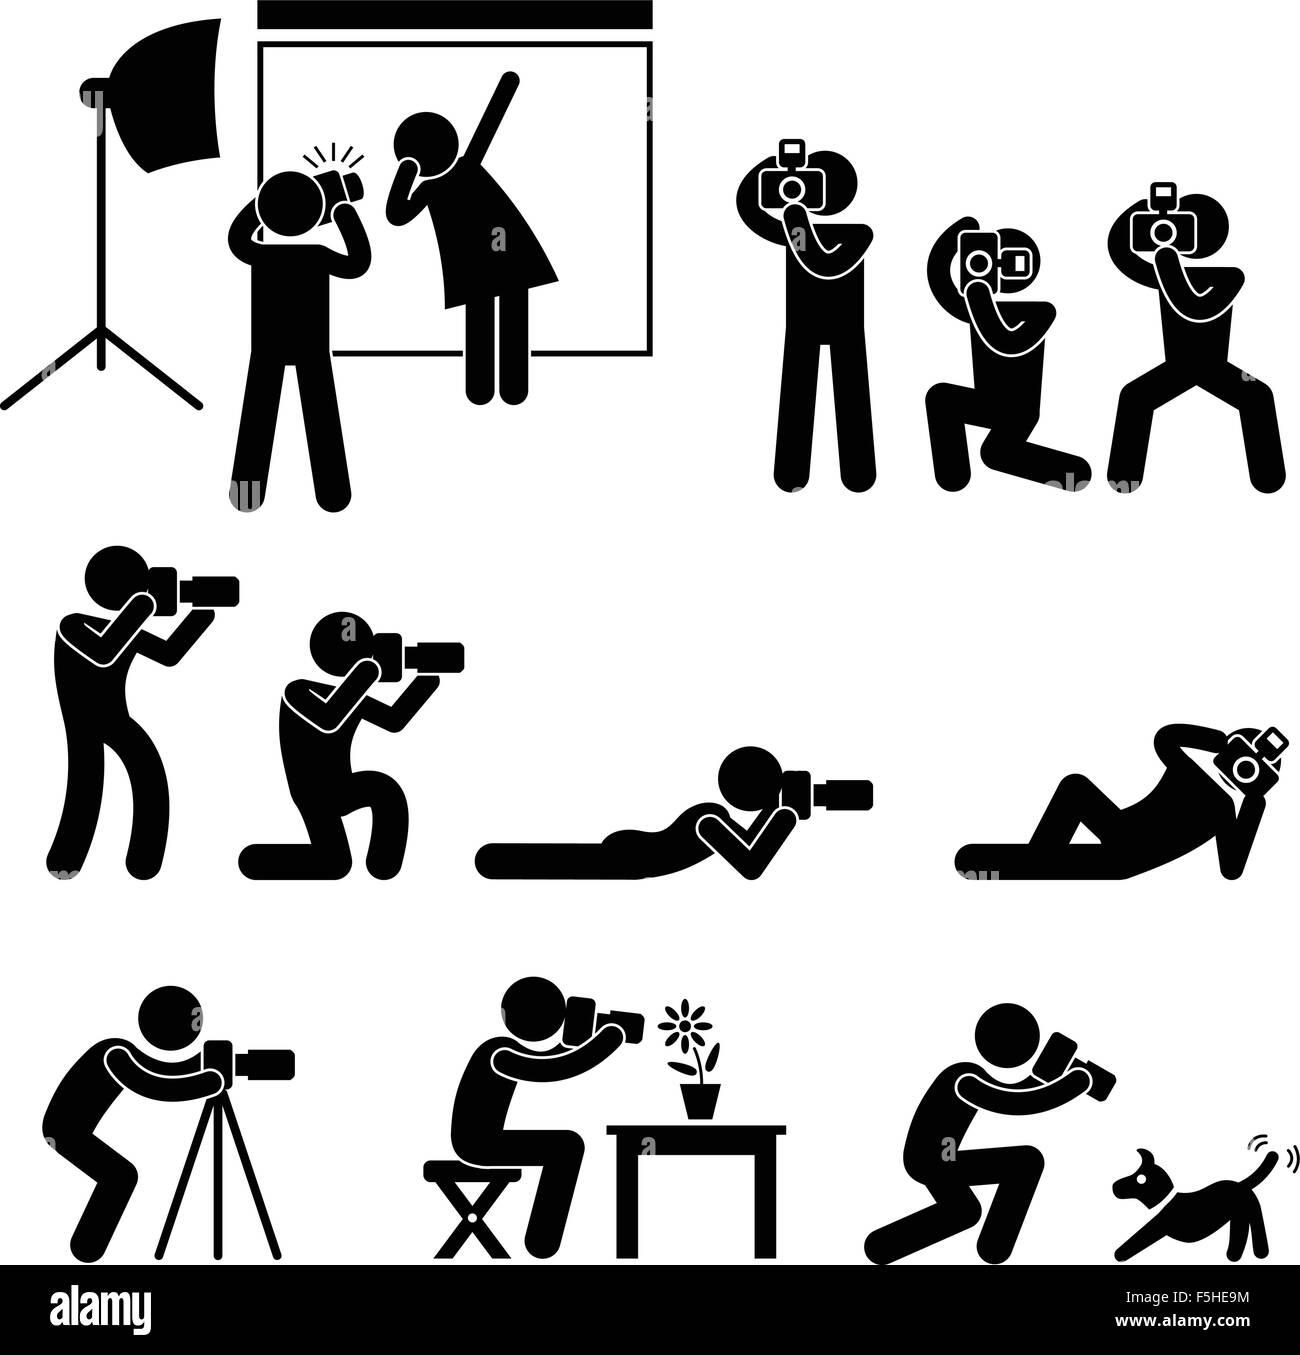 Photographer Cameraman Paparazzi Pose Posing Icon Symbol Sign Pictogram - Stock Image